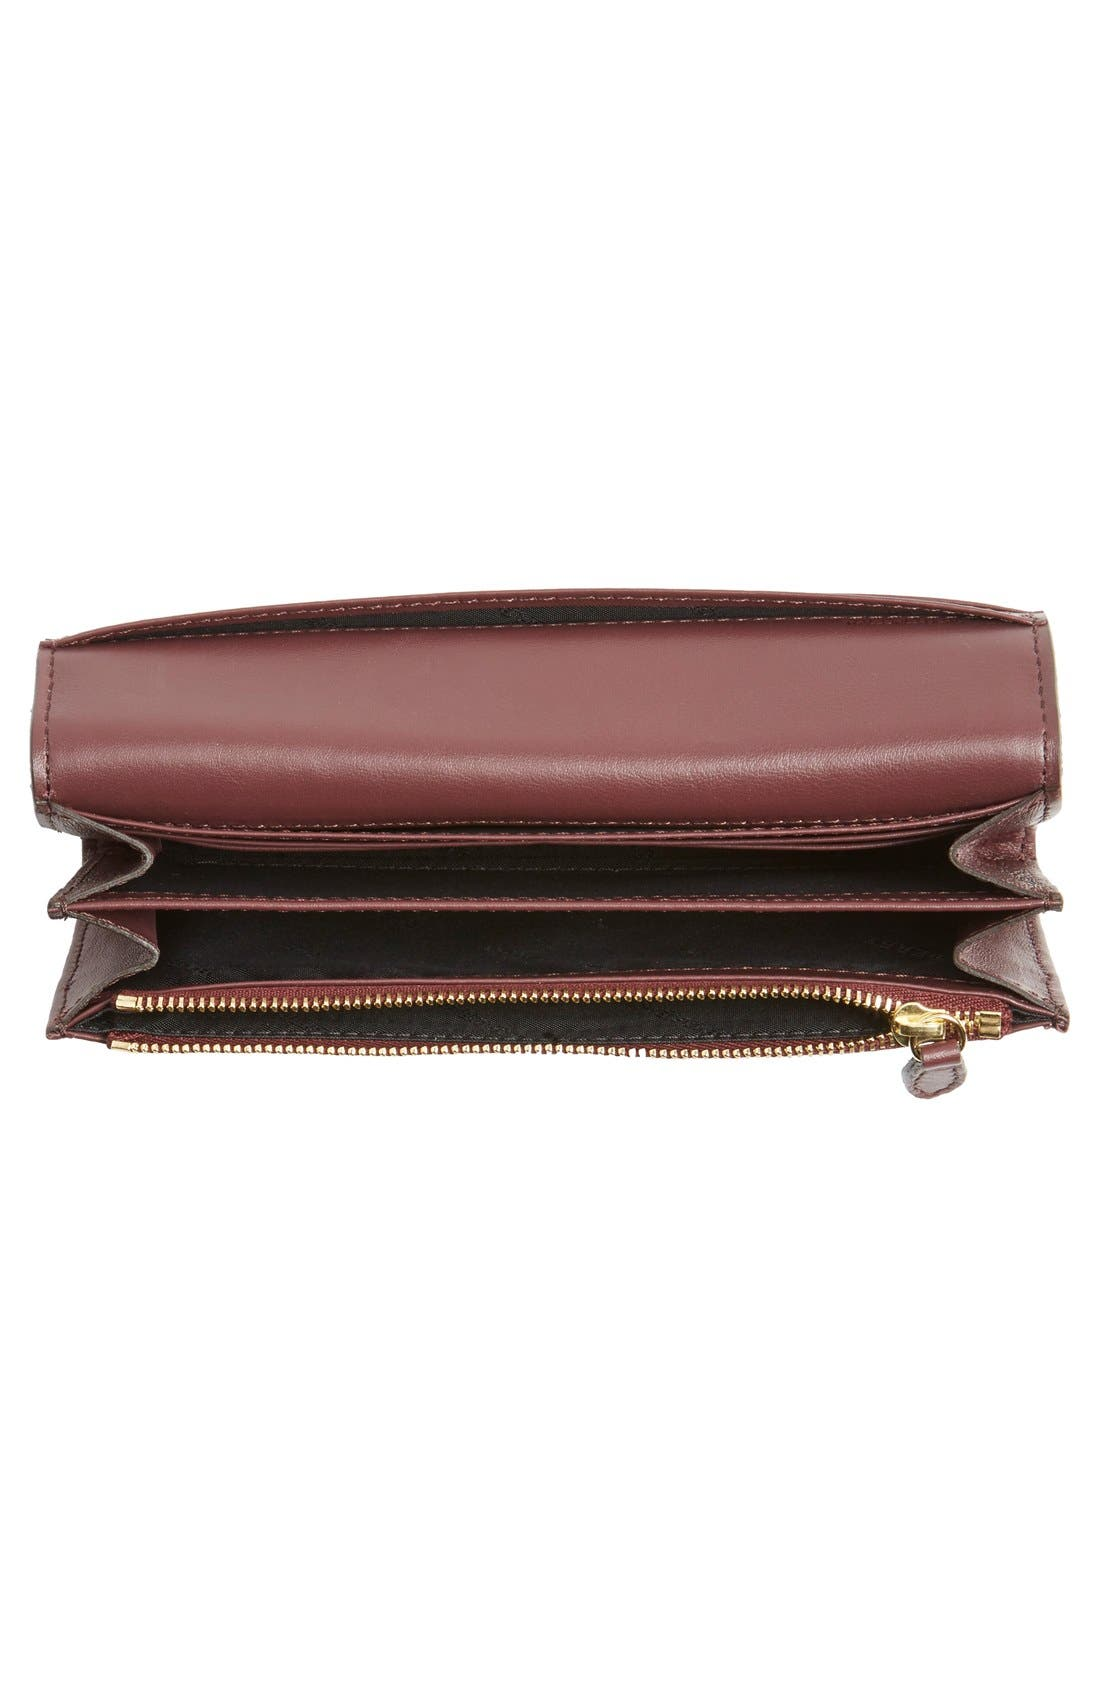 'Porter - Check' Continental Wallet,                             Alternate thumbnail 3, color,